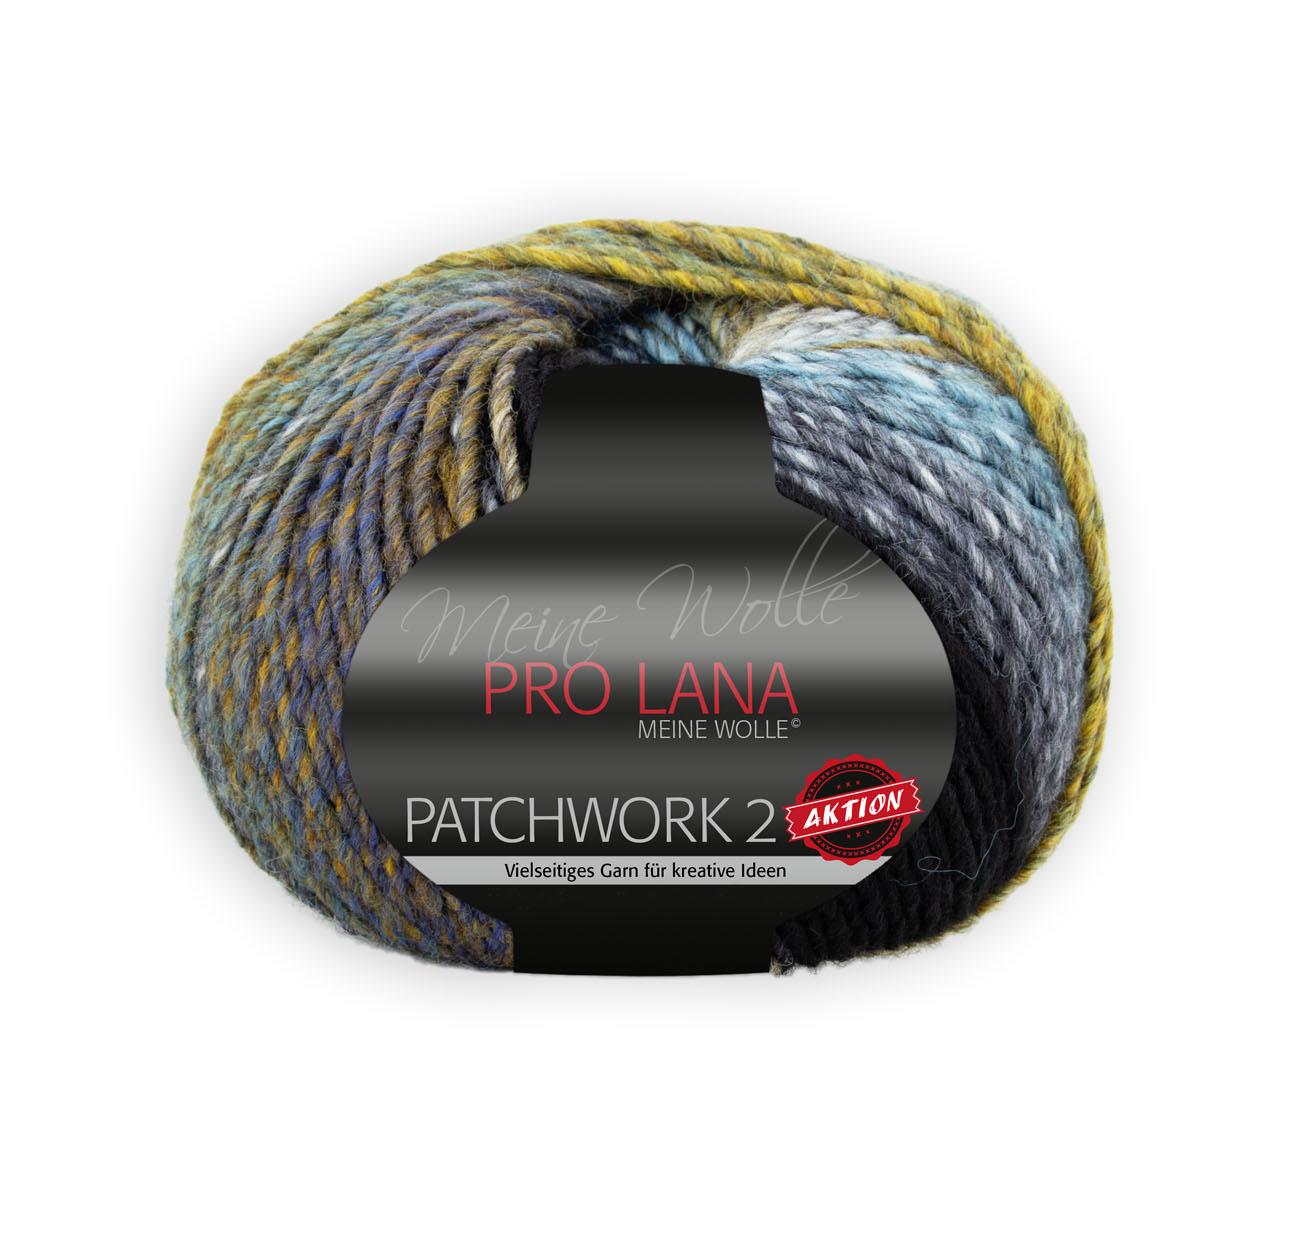 Pro Lana PATCHWORK 2   Aktion 6kg